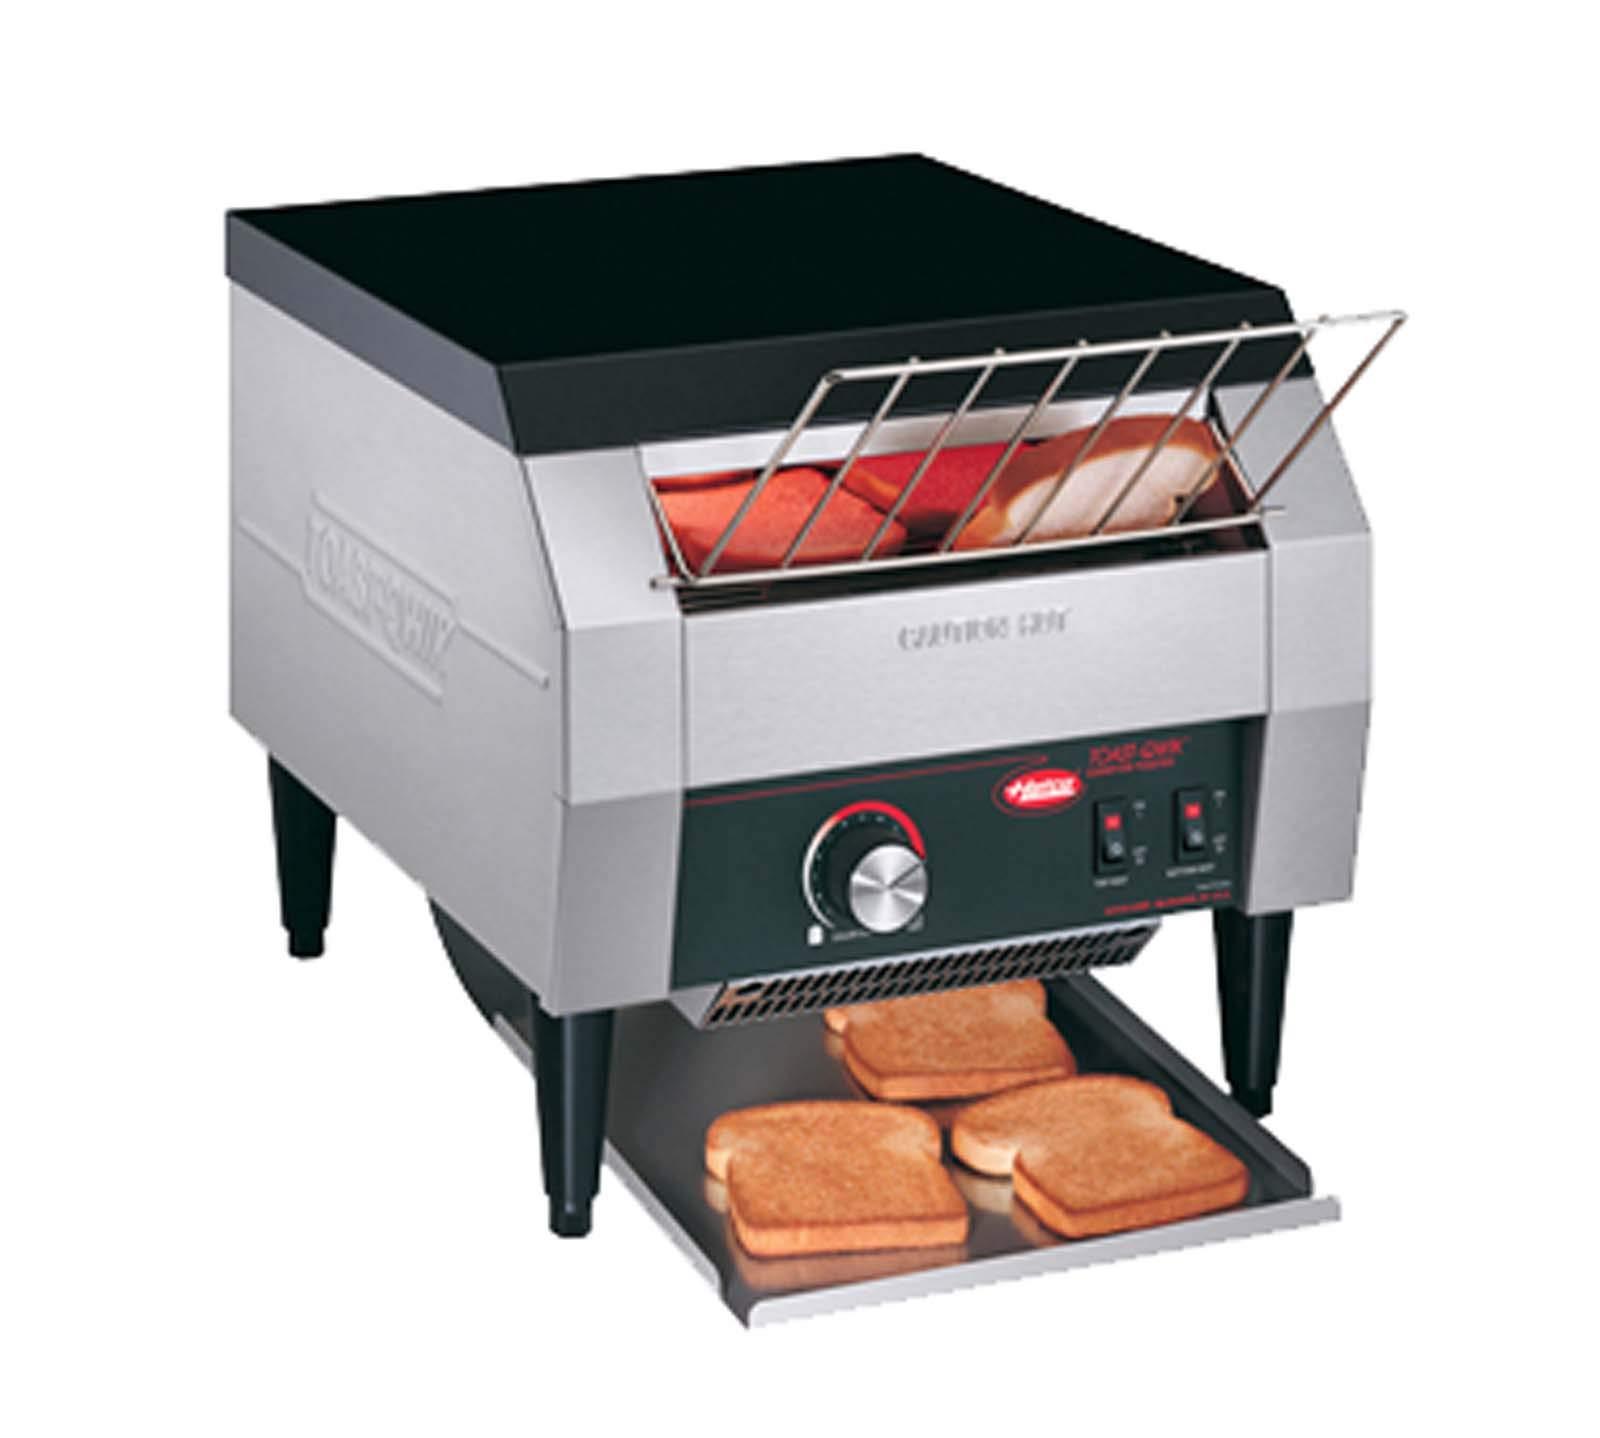 Hatco TQ-10-120-QS (QUICK SHIP MODEL) Toast-Qwik Conveyor Toaster